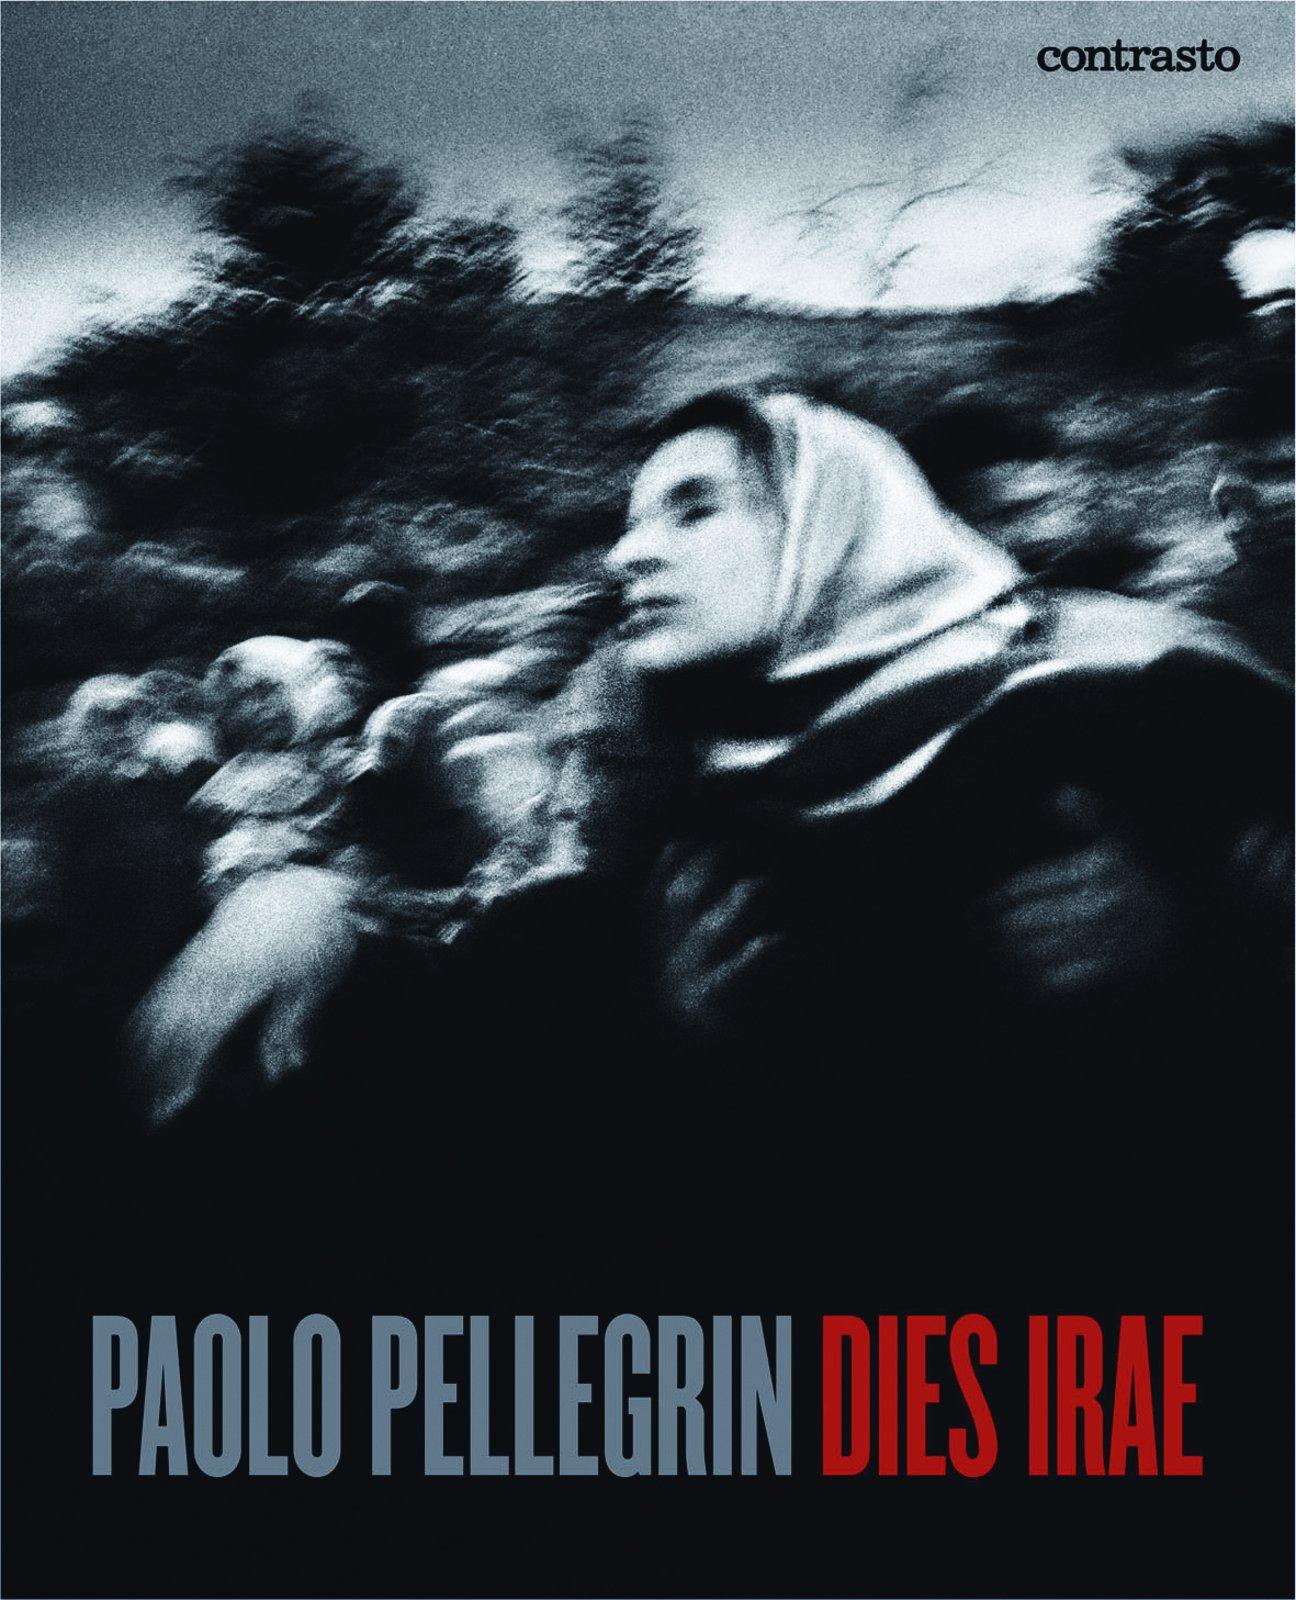 Paolo Pellegrin - Dies Irae   Gonçalo Delgado